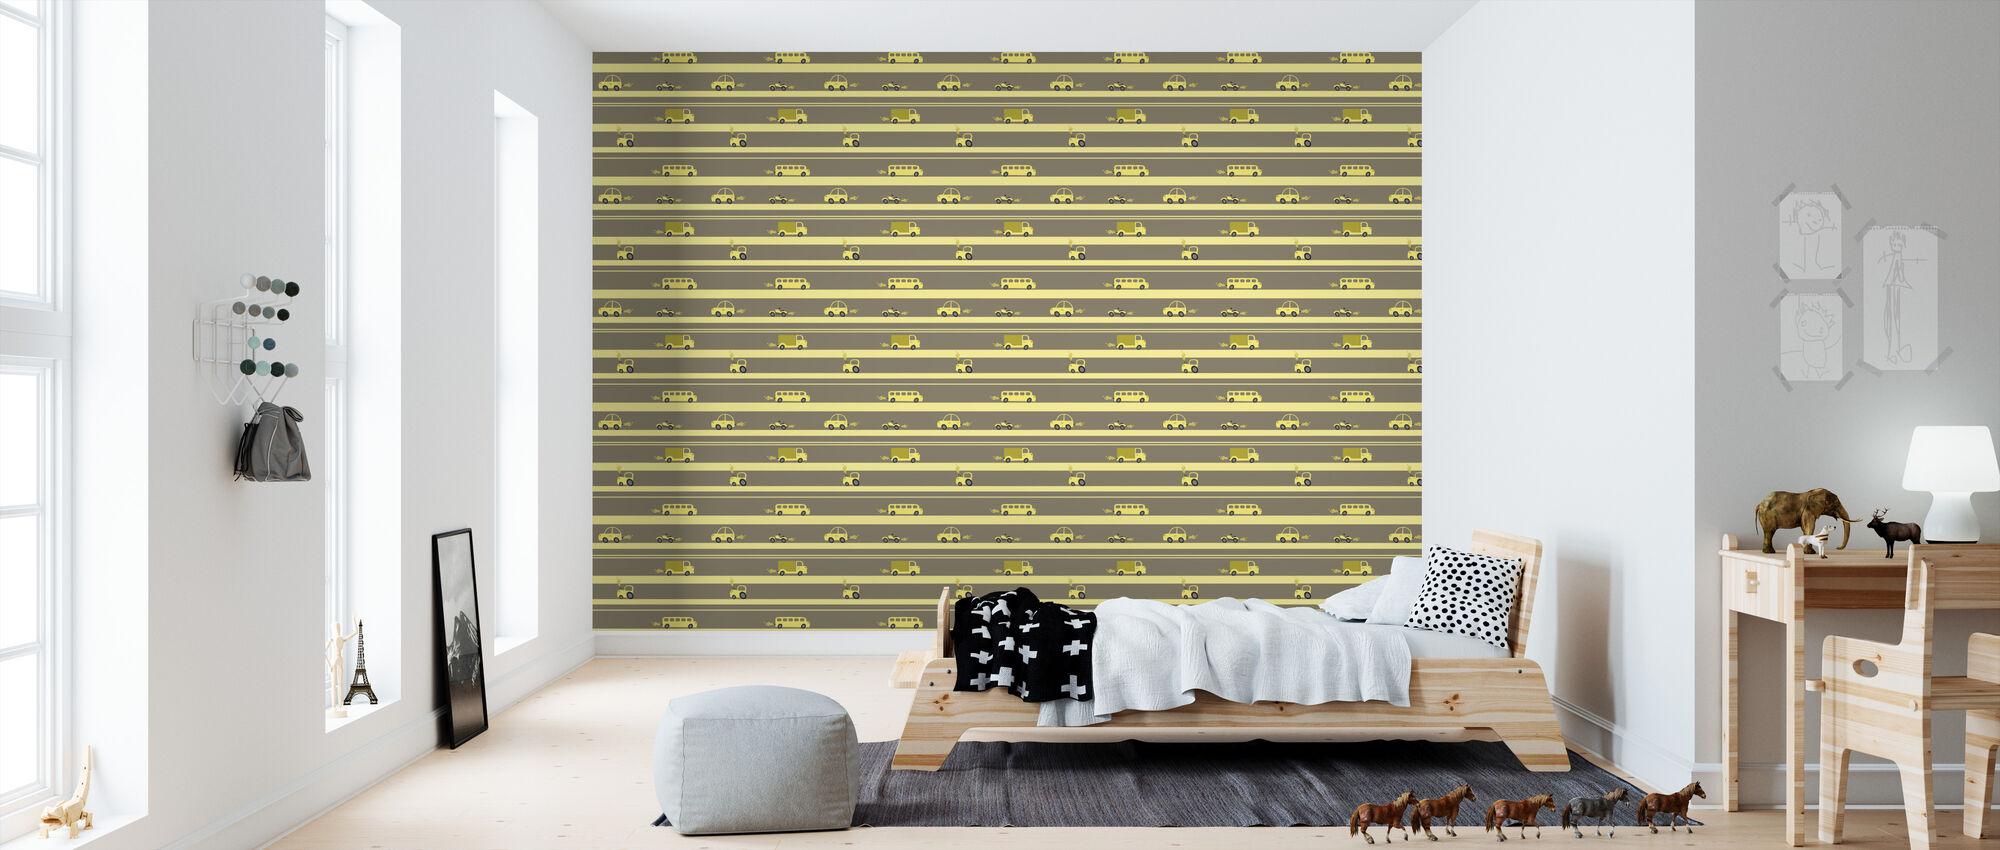 Brum Brum - Yellow - Wallpaper - Kids Room